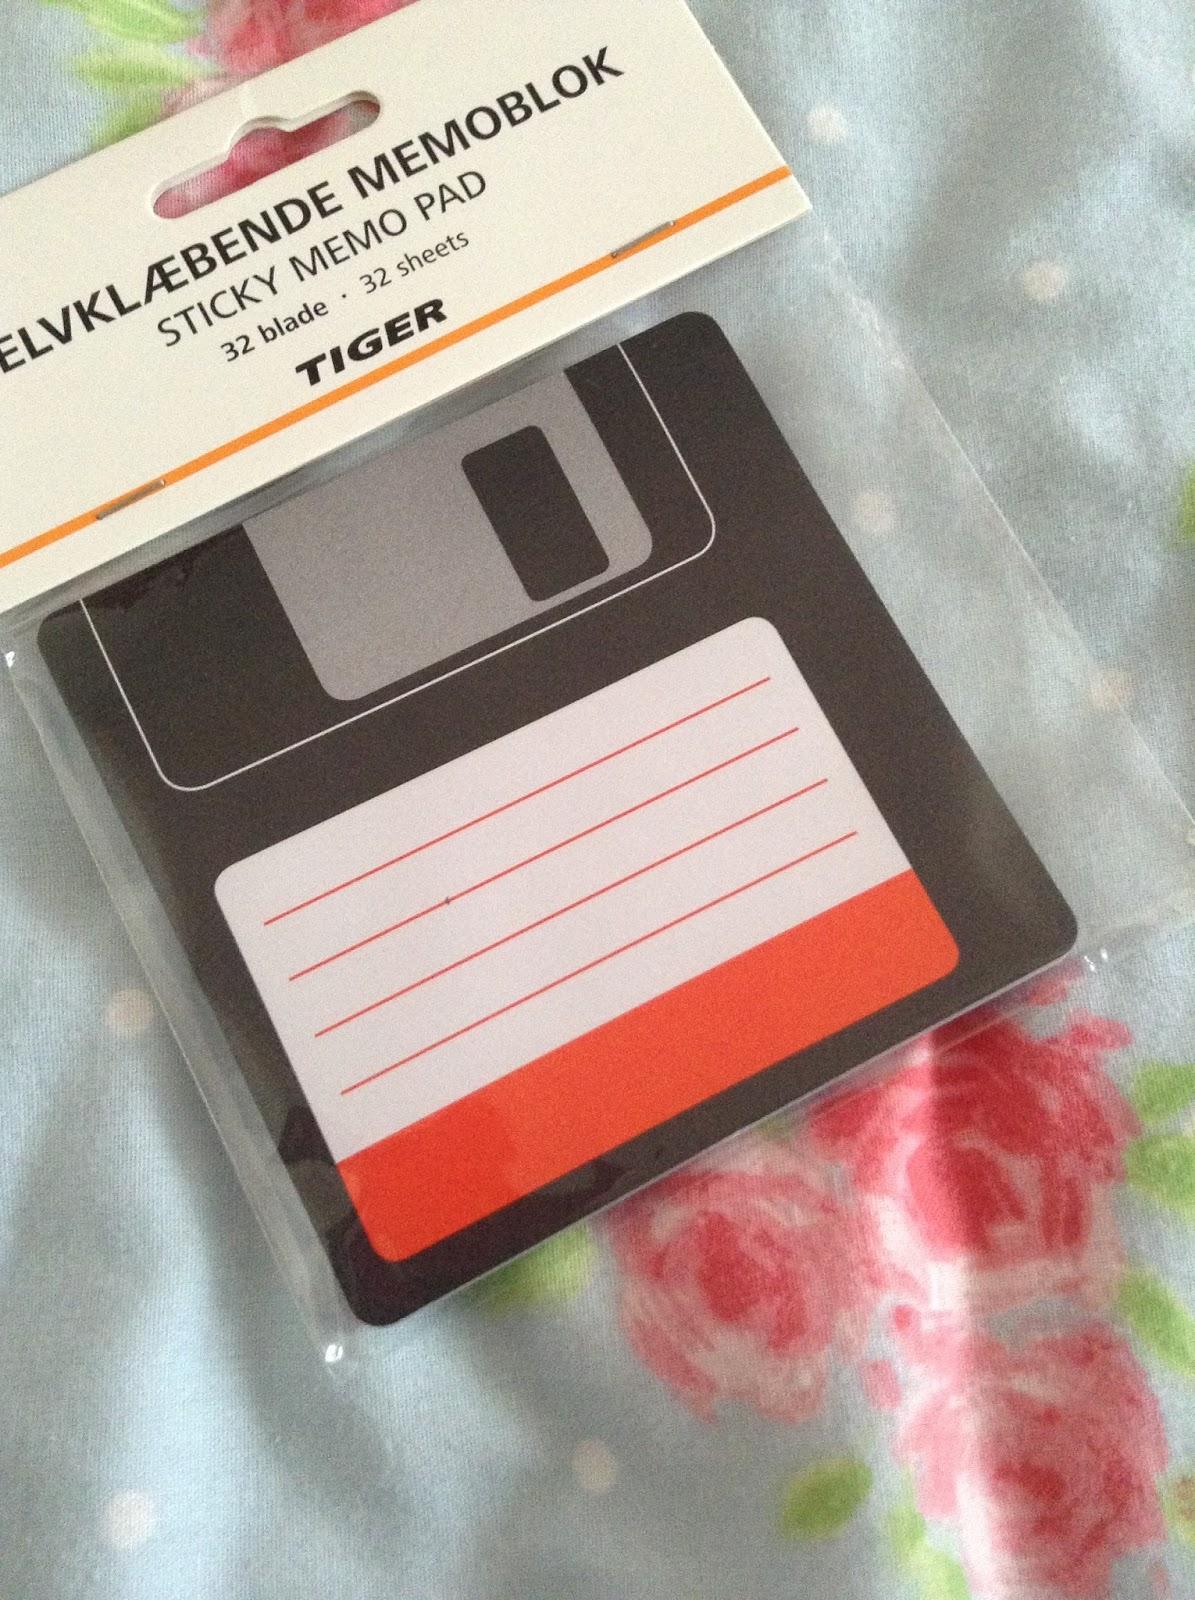 floppy disk price